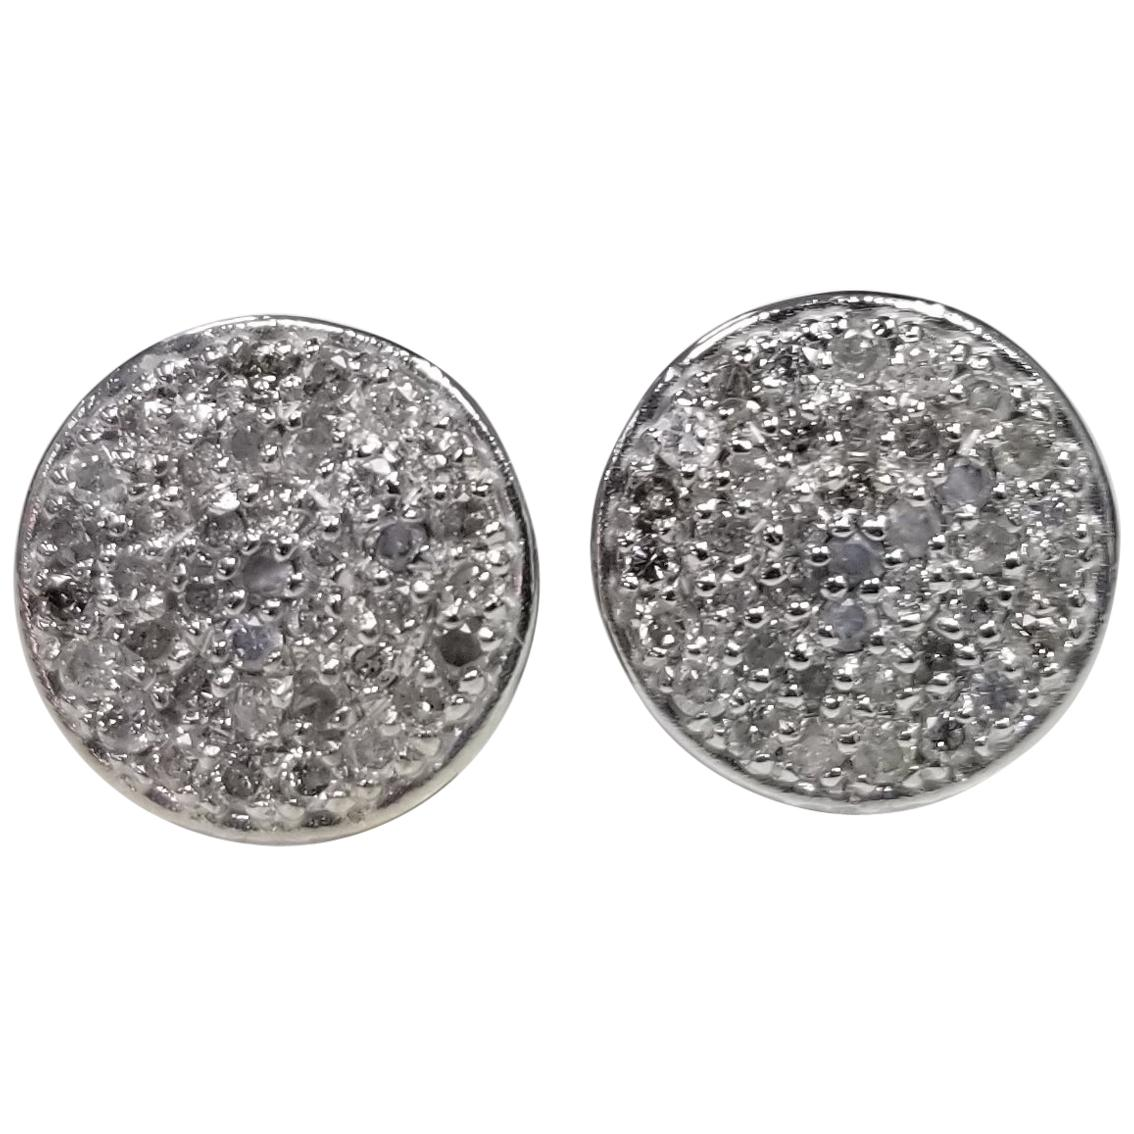 14 Karat White Gold Diamond Cluster Round Earrings Pave' Set